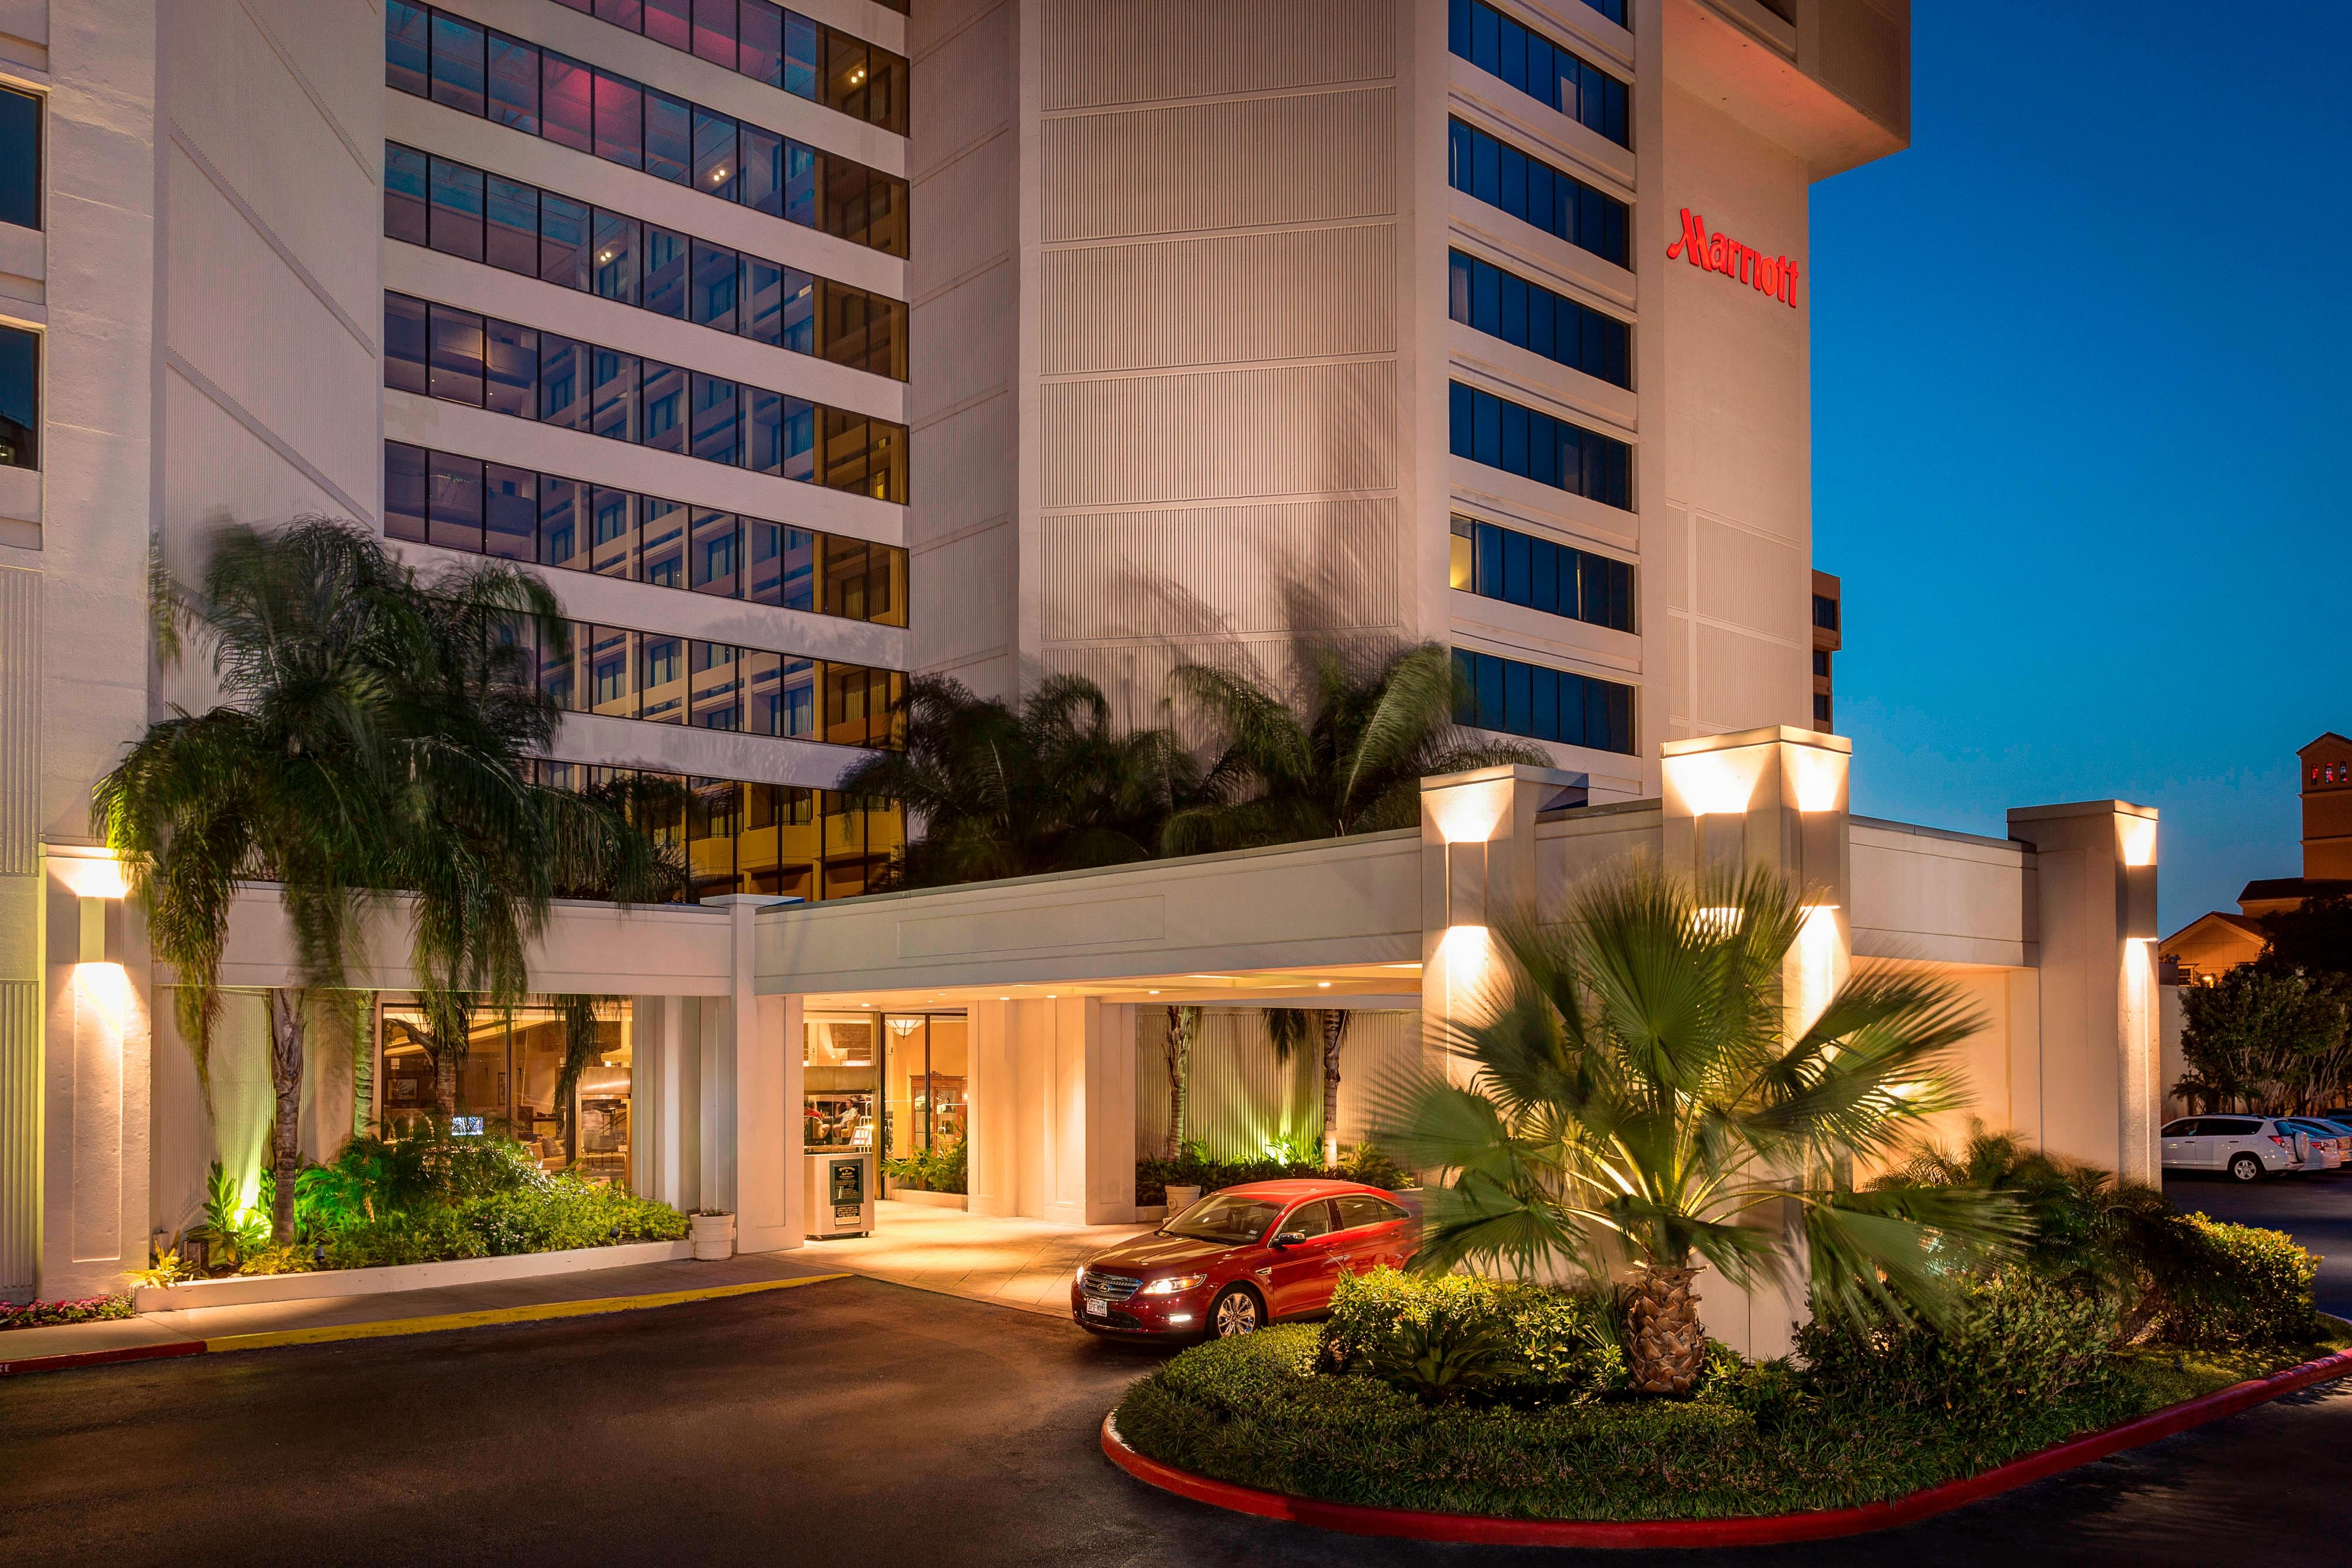 Hotel en Westchase, Houston